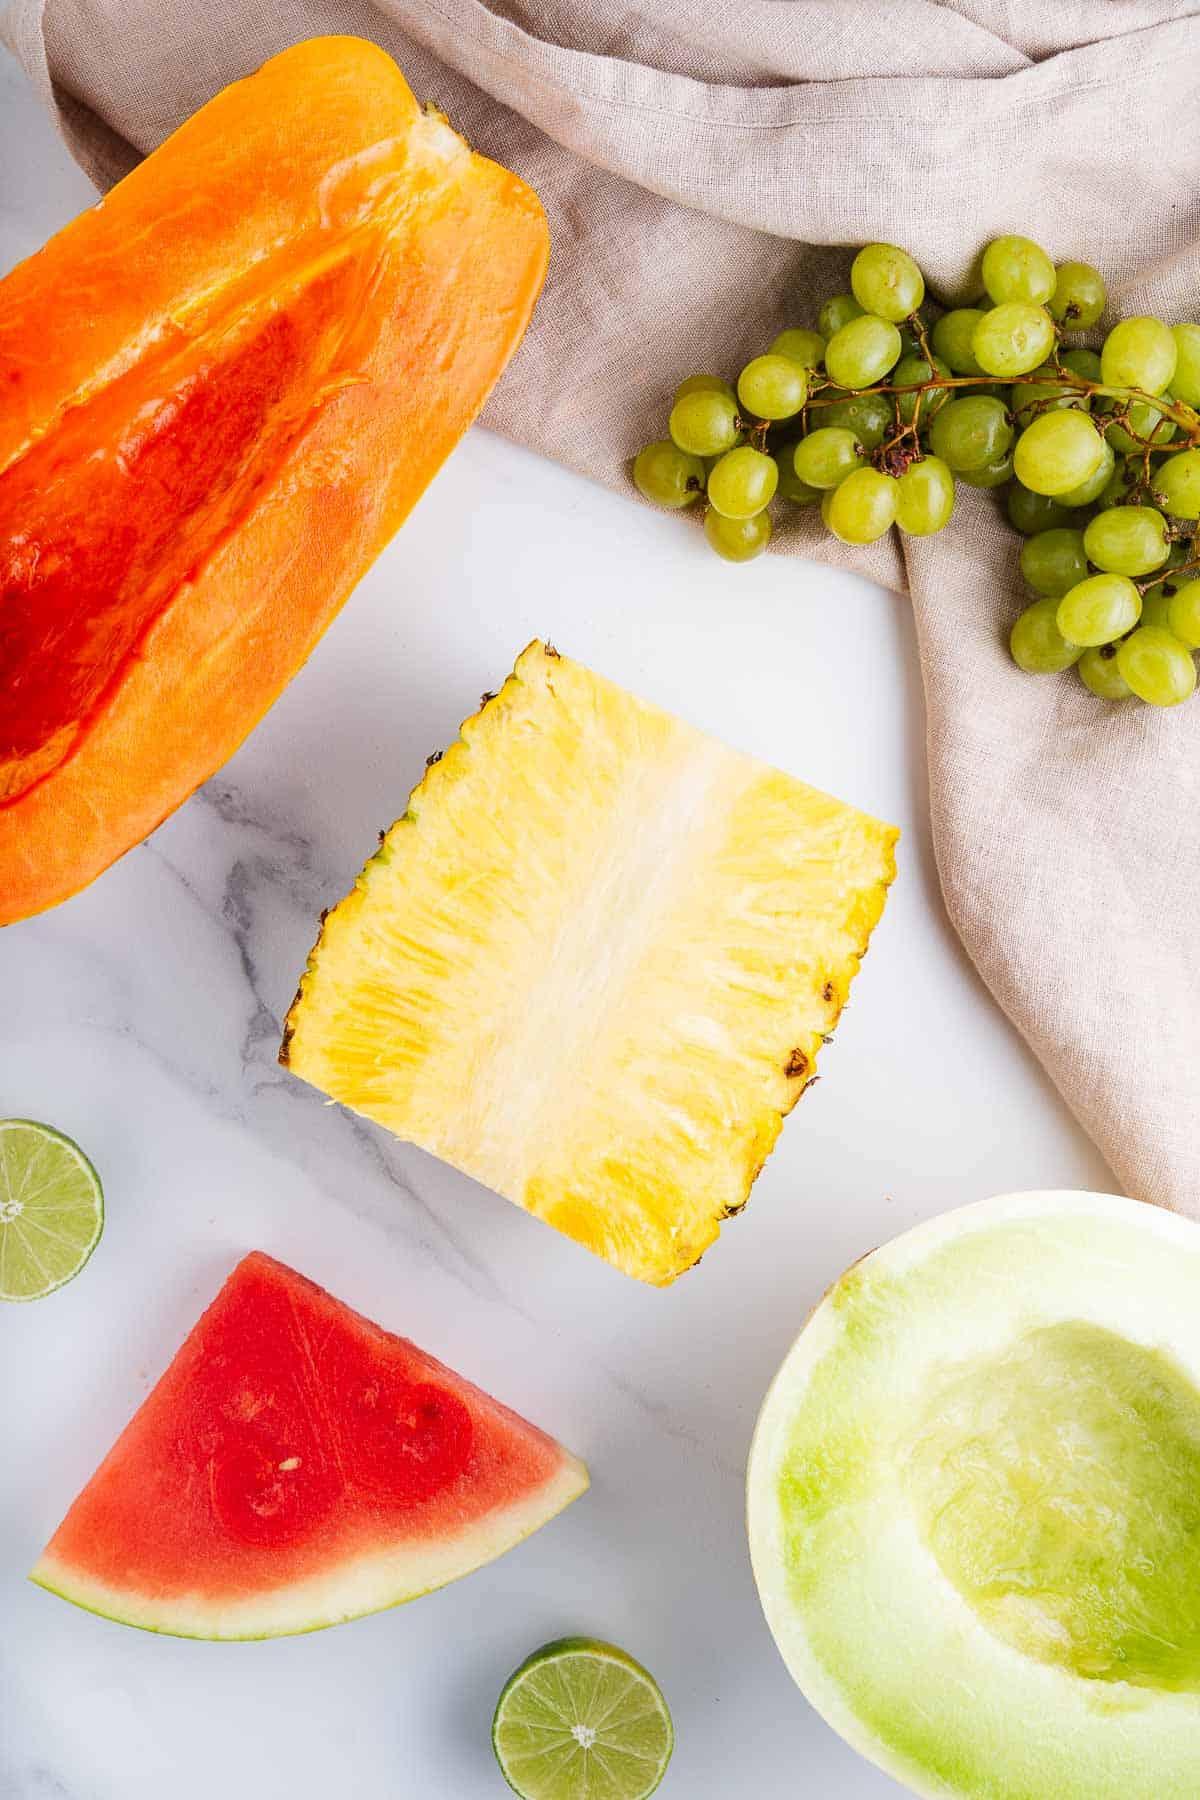 Papaya, Pineapple, Watermelon, Limes, Honeydew, and Grapes